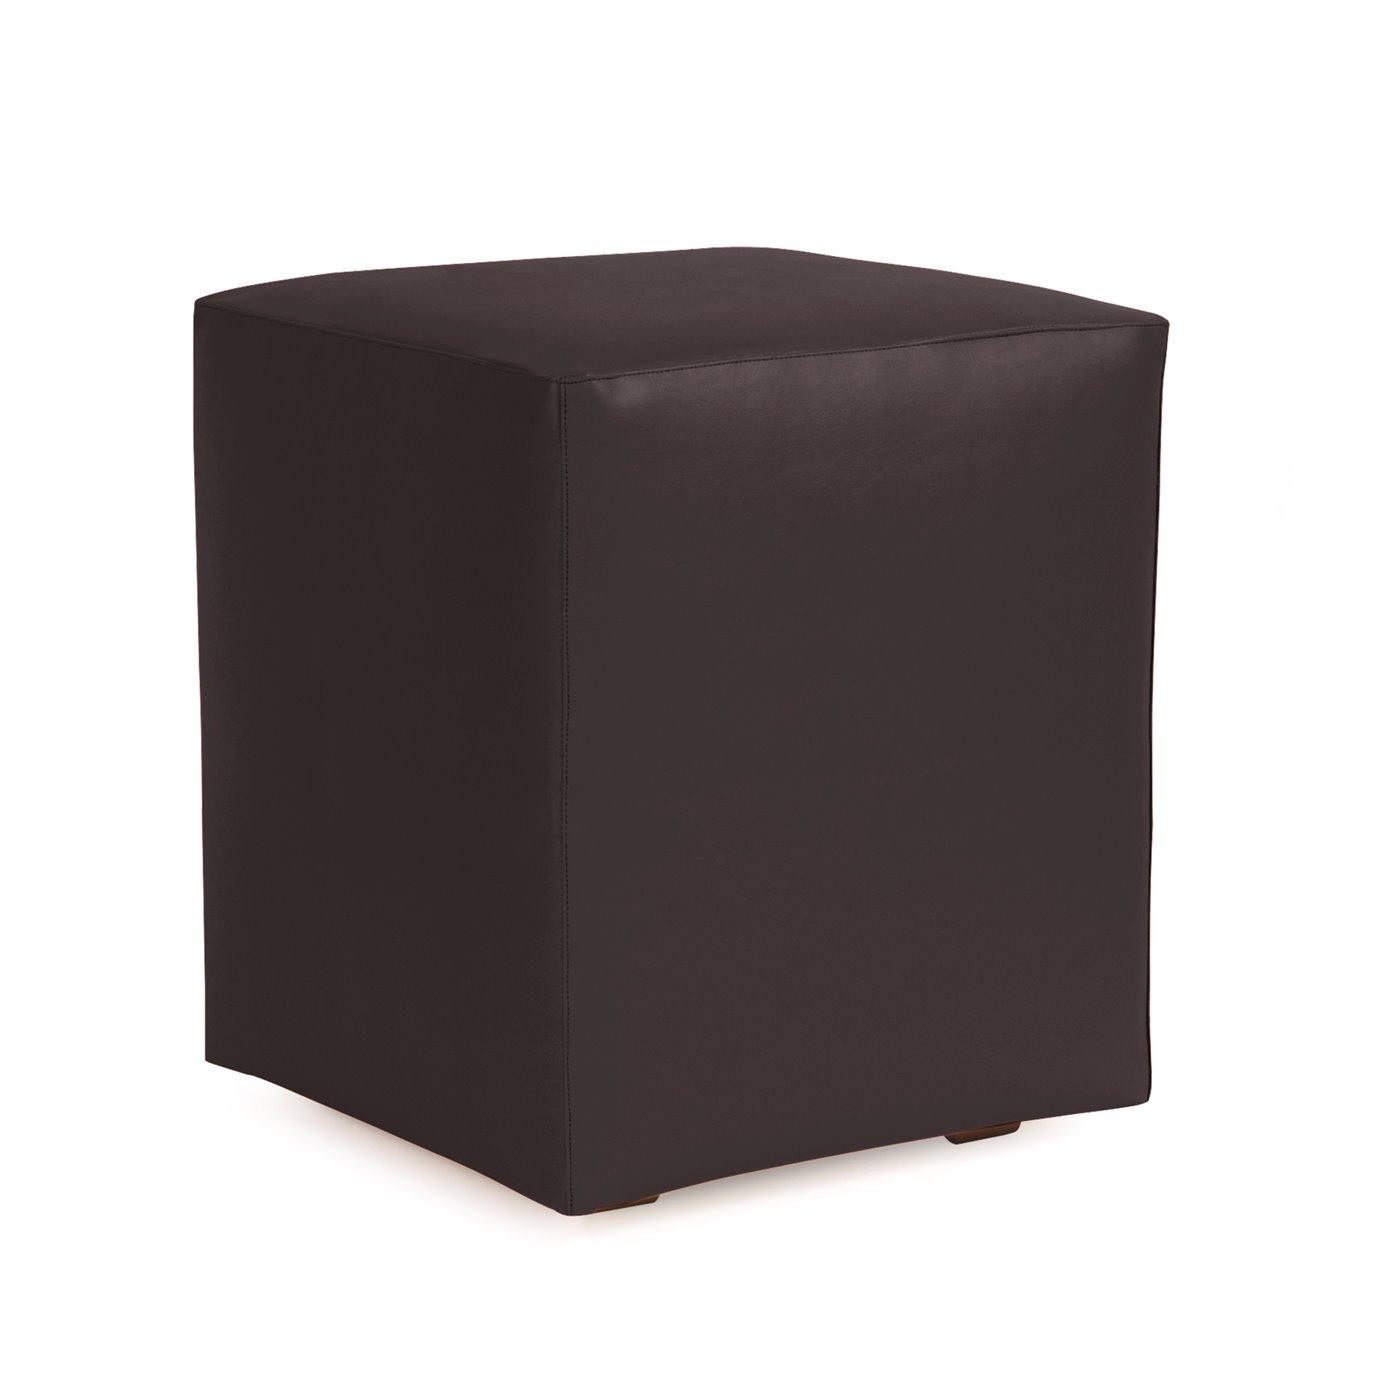 Howard Elliott Universal Cube Outdoor Marine Grade Vinyl Atlantis Black Complete Ottoman